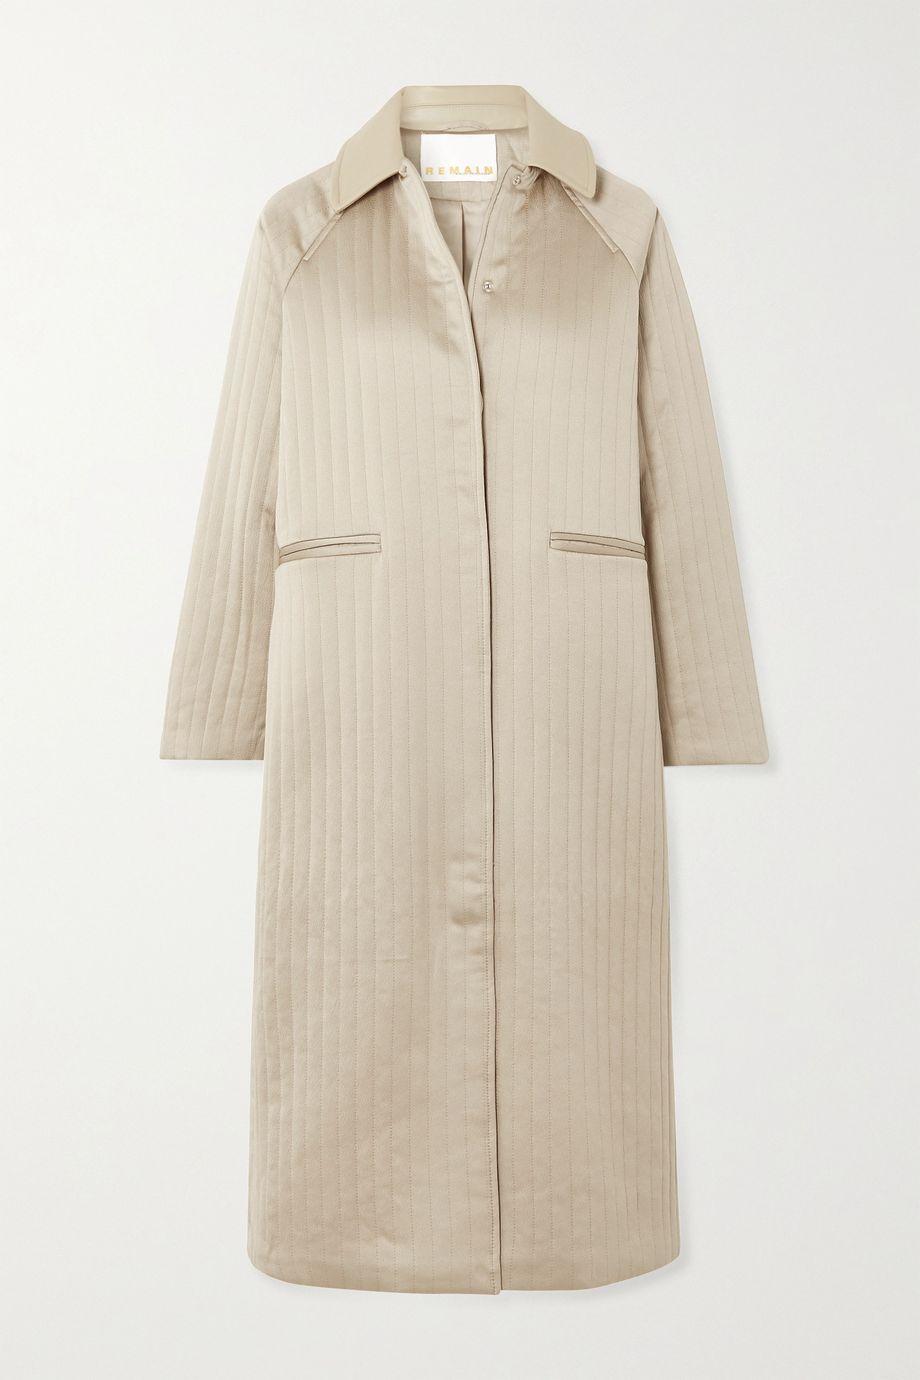 REMAIN Birger Christensen Kyoto leather-trimmed quilted hammered-satin coat